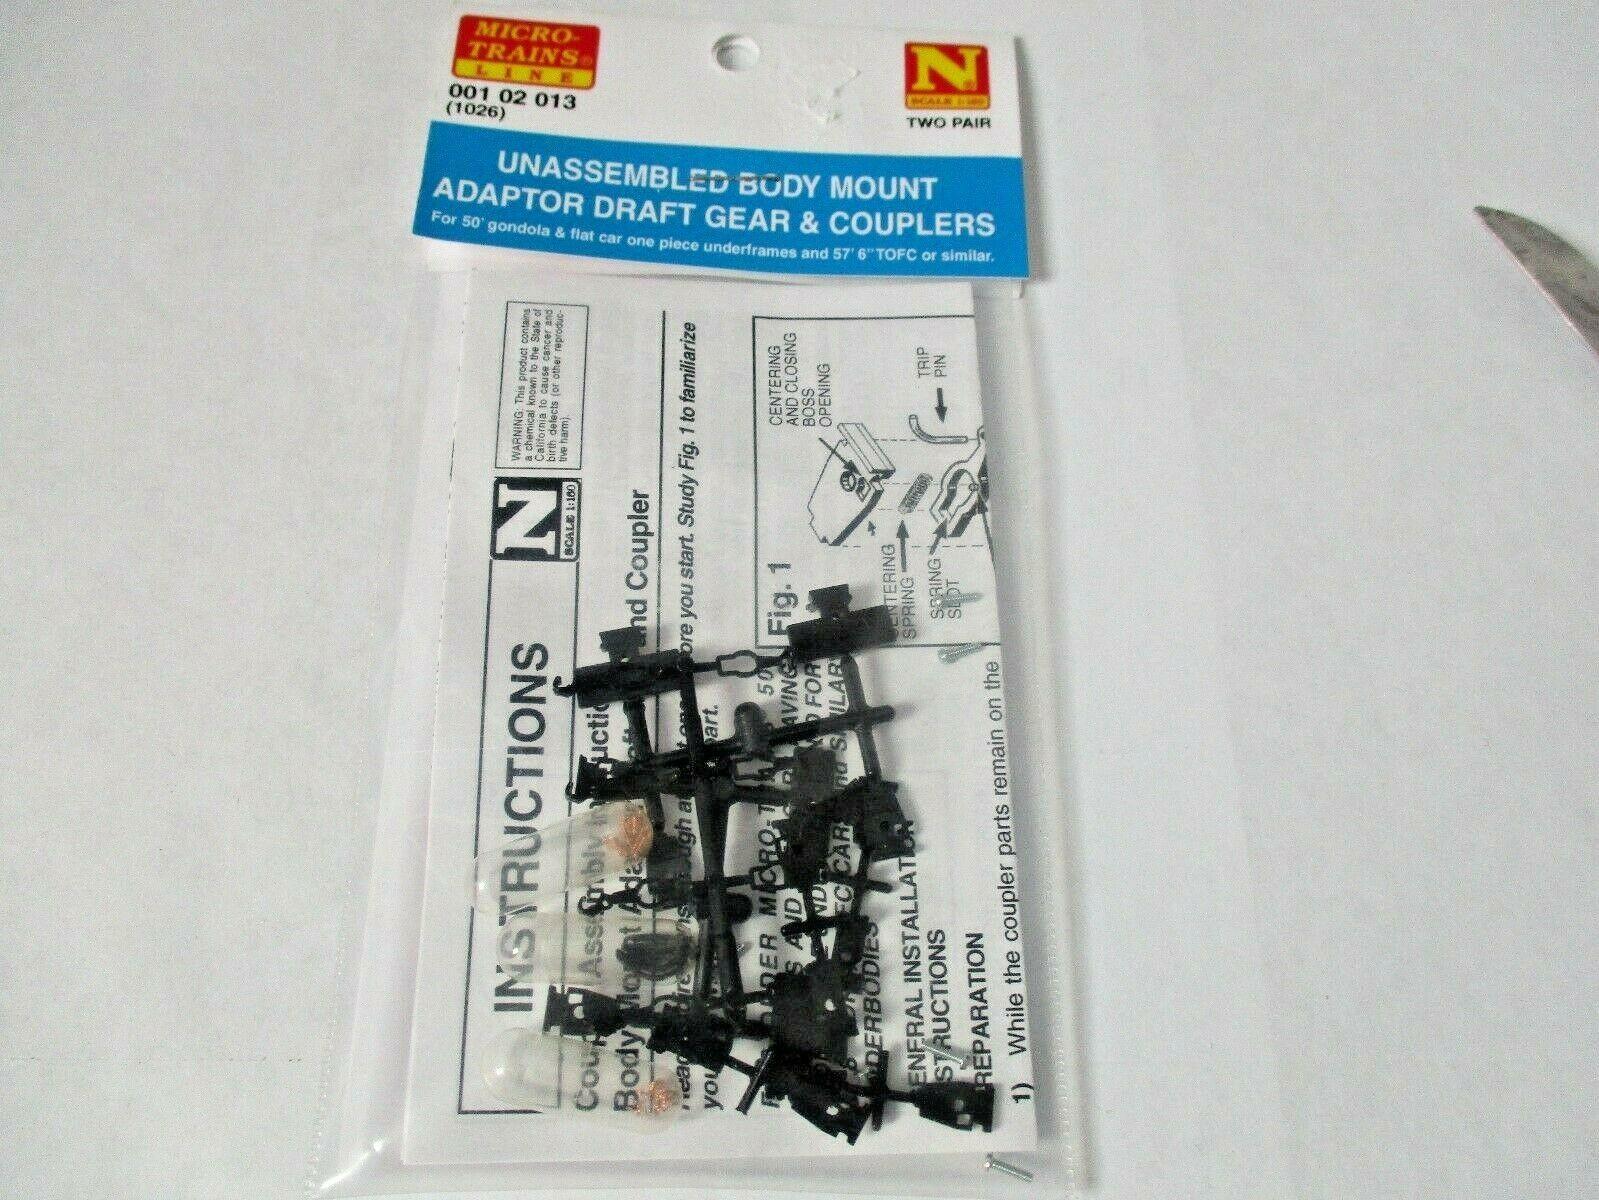 Micro-Trains Stock #00102013 (1026) Unassembled Body Mount Adaptor Draft Gear